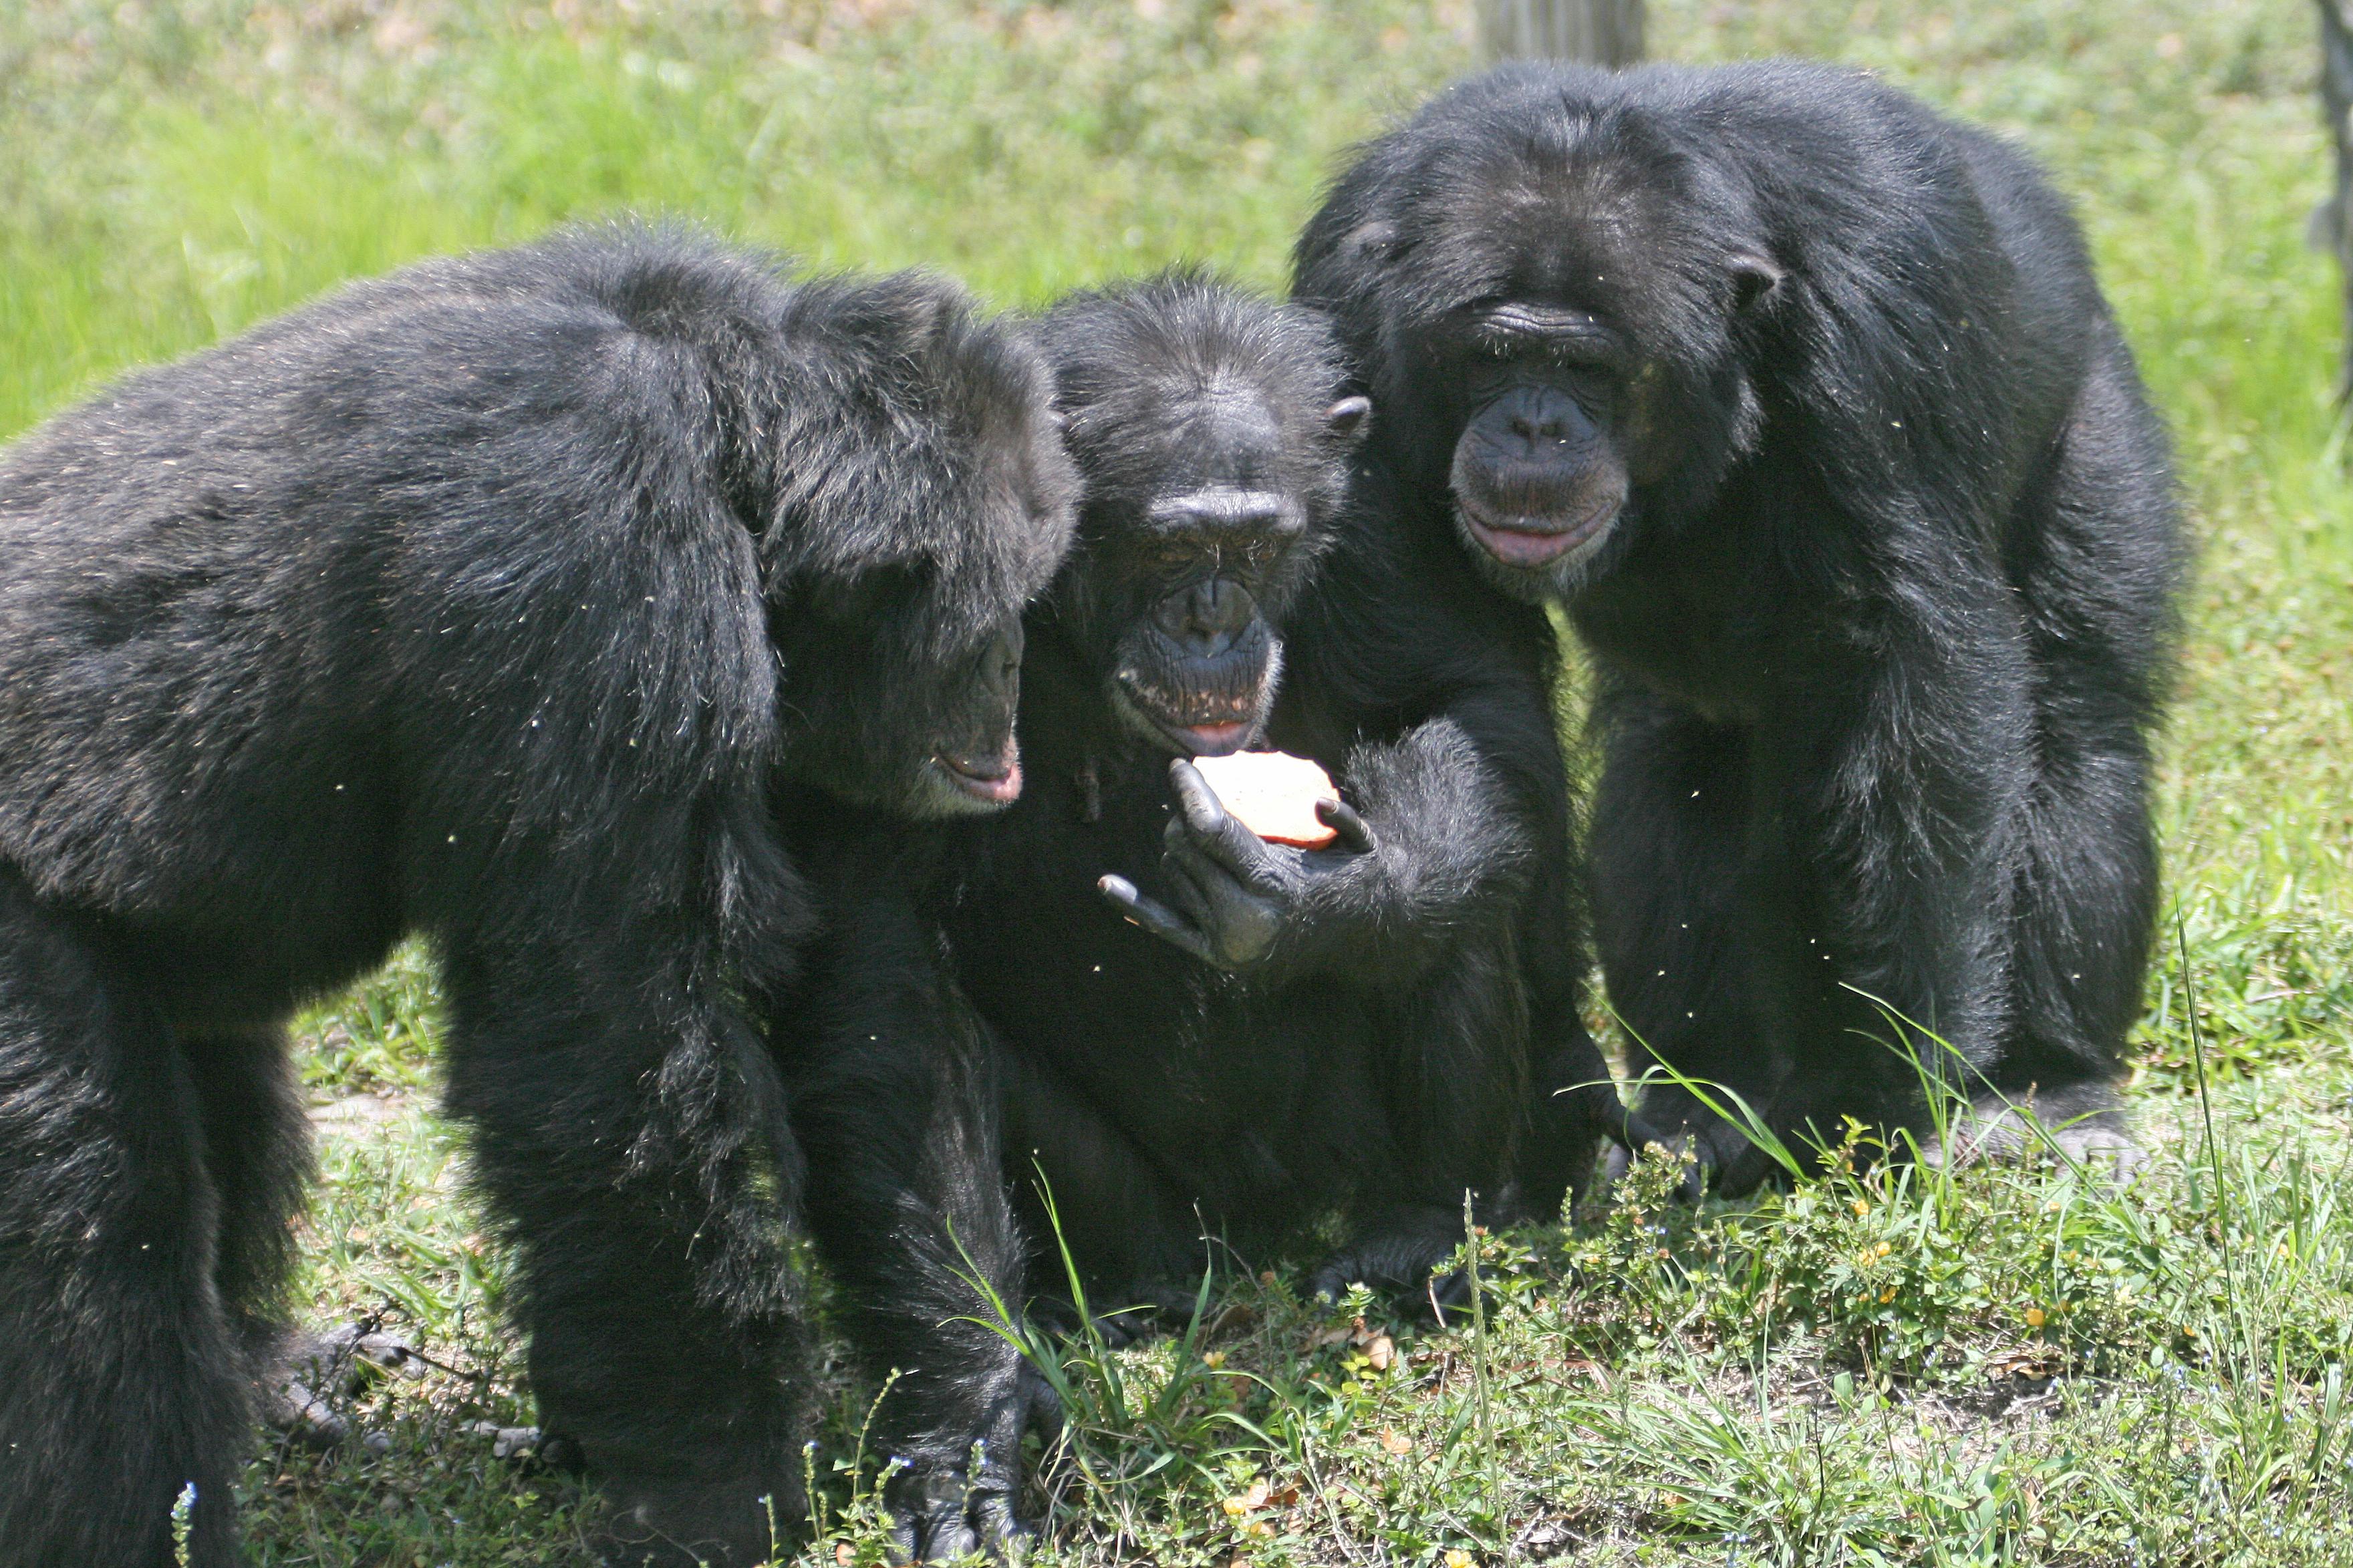 Chimpanzees are social animals.